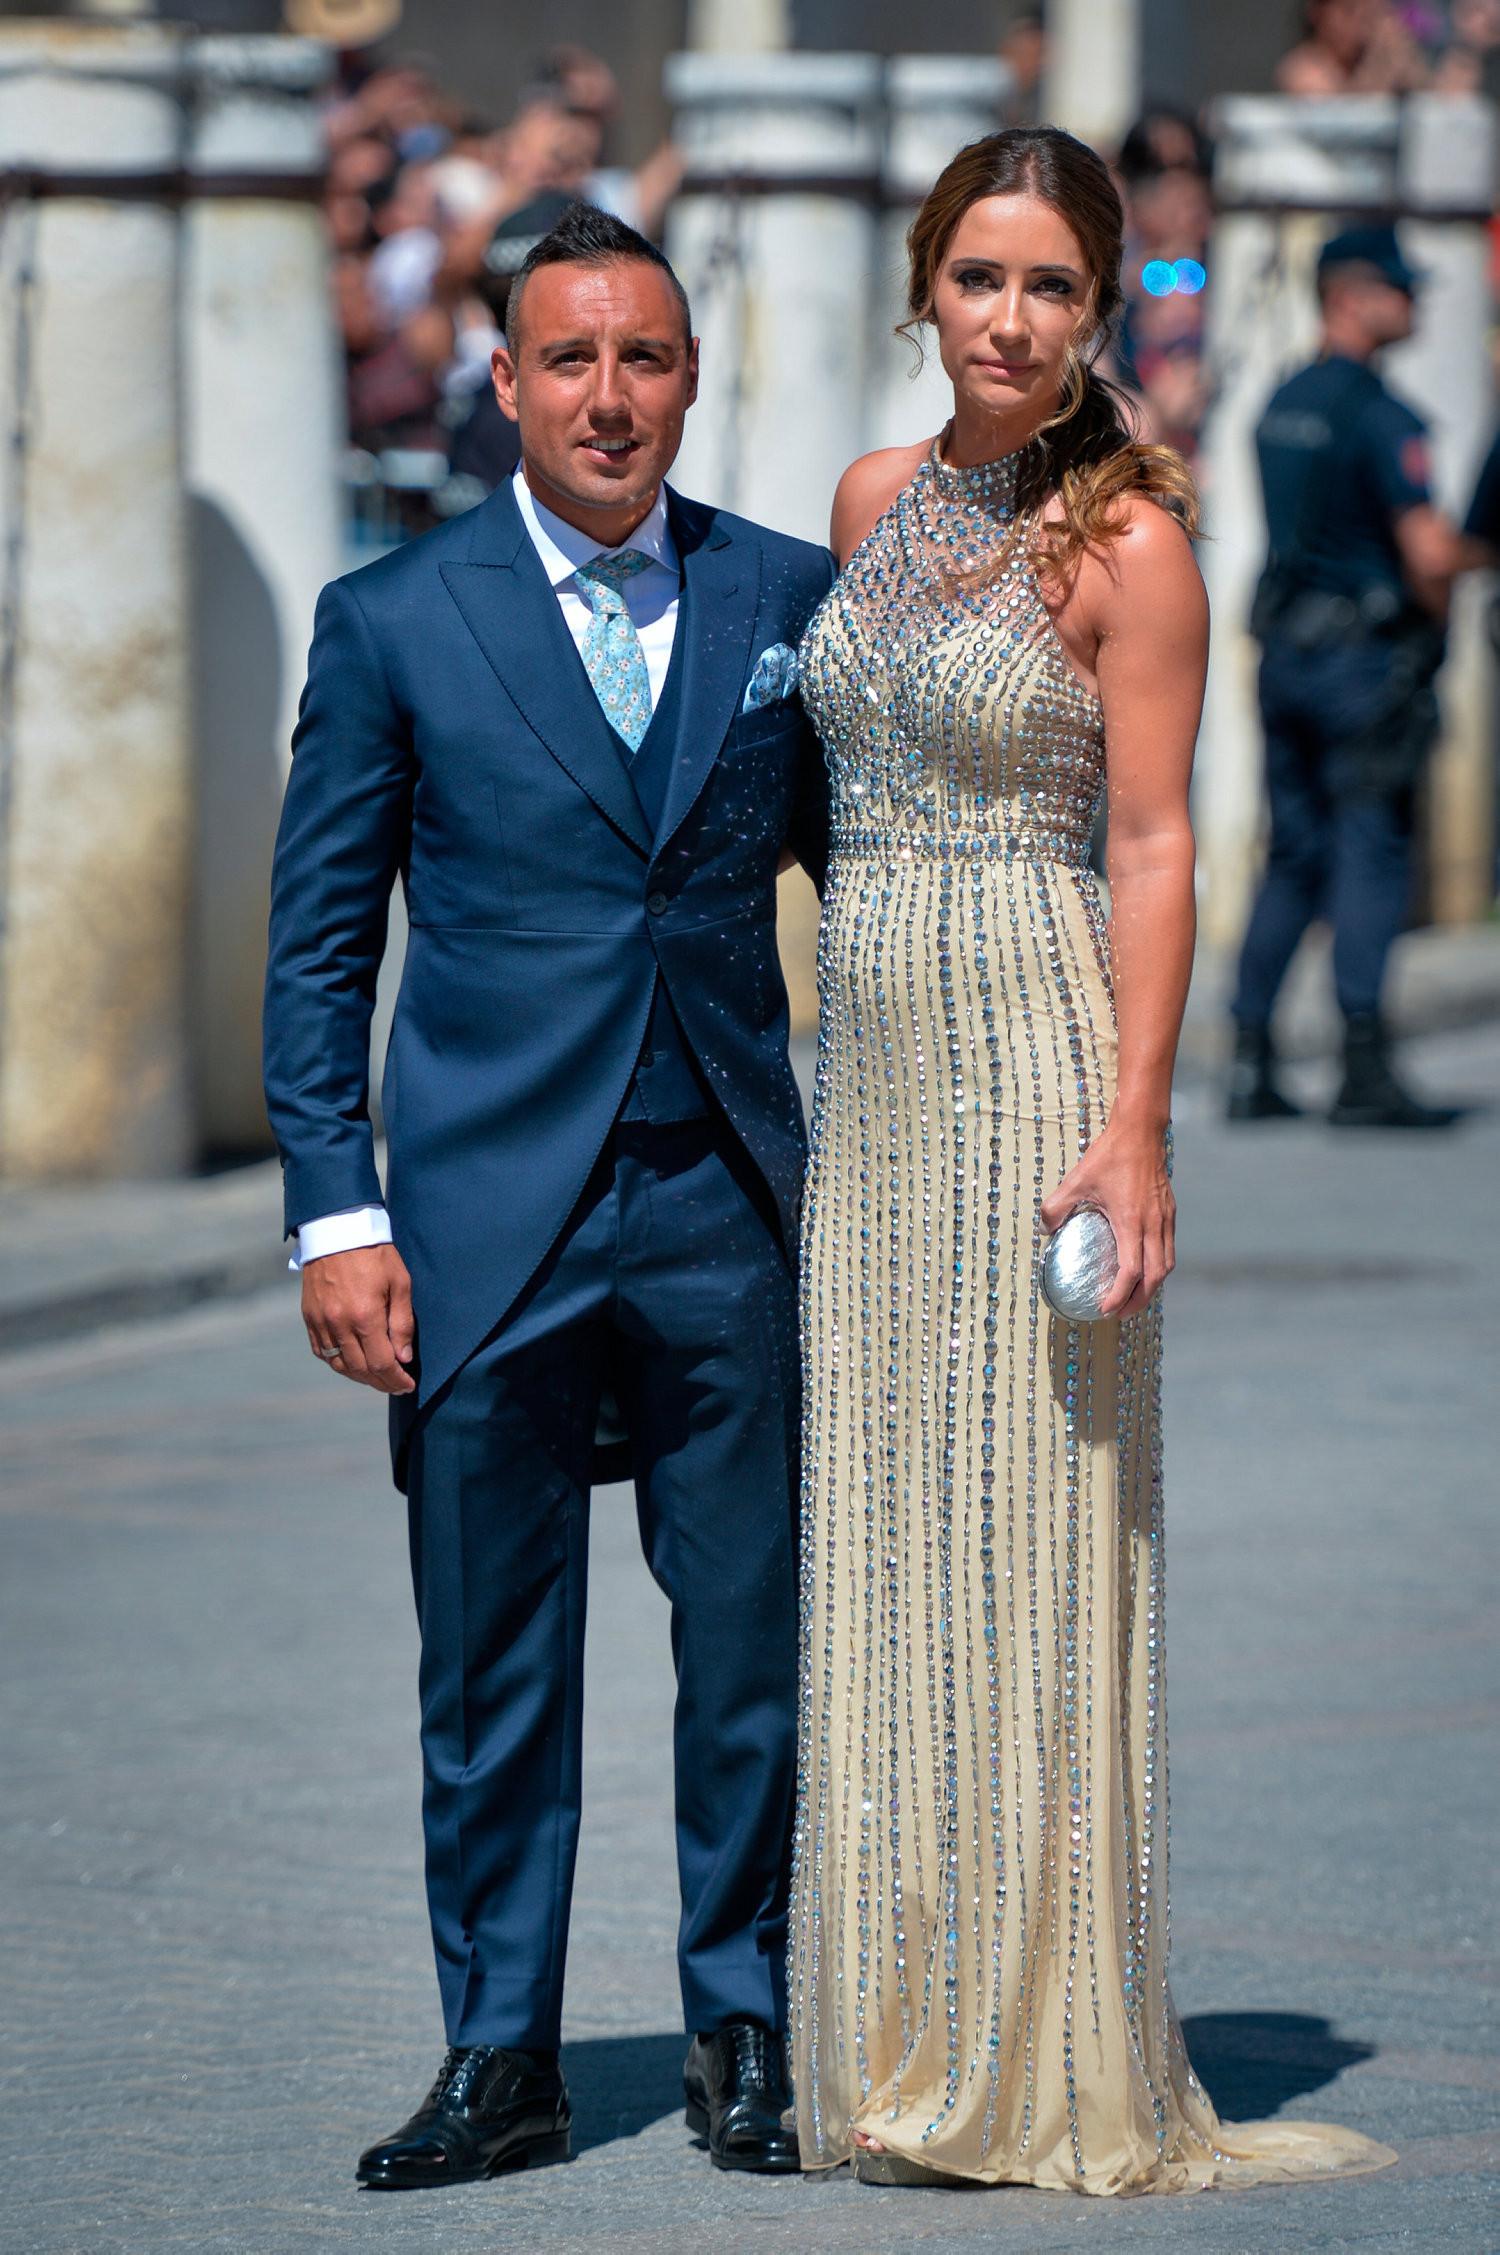 David and Victoria Beckham join football stars at Sergio Ramos wedding Photos